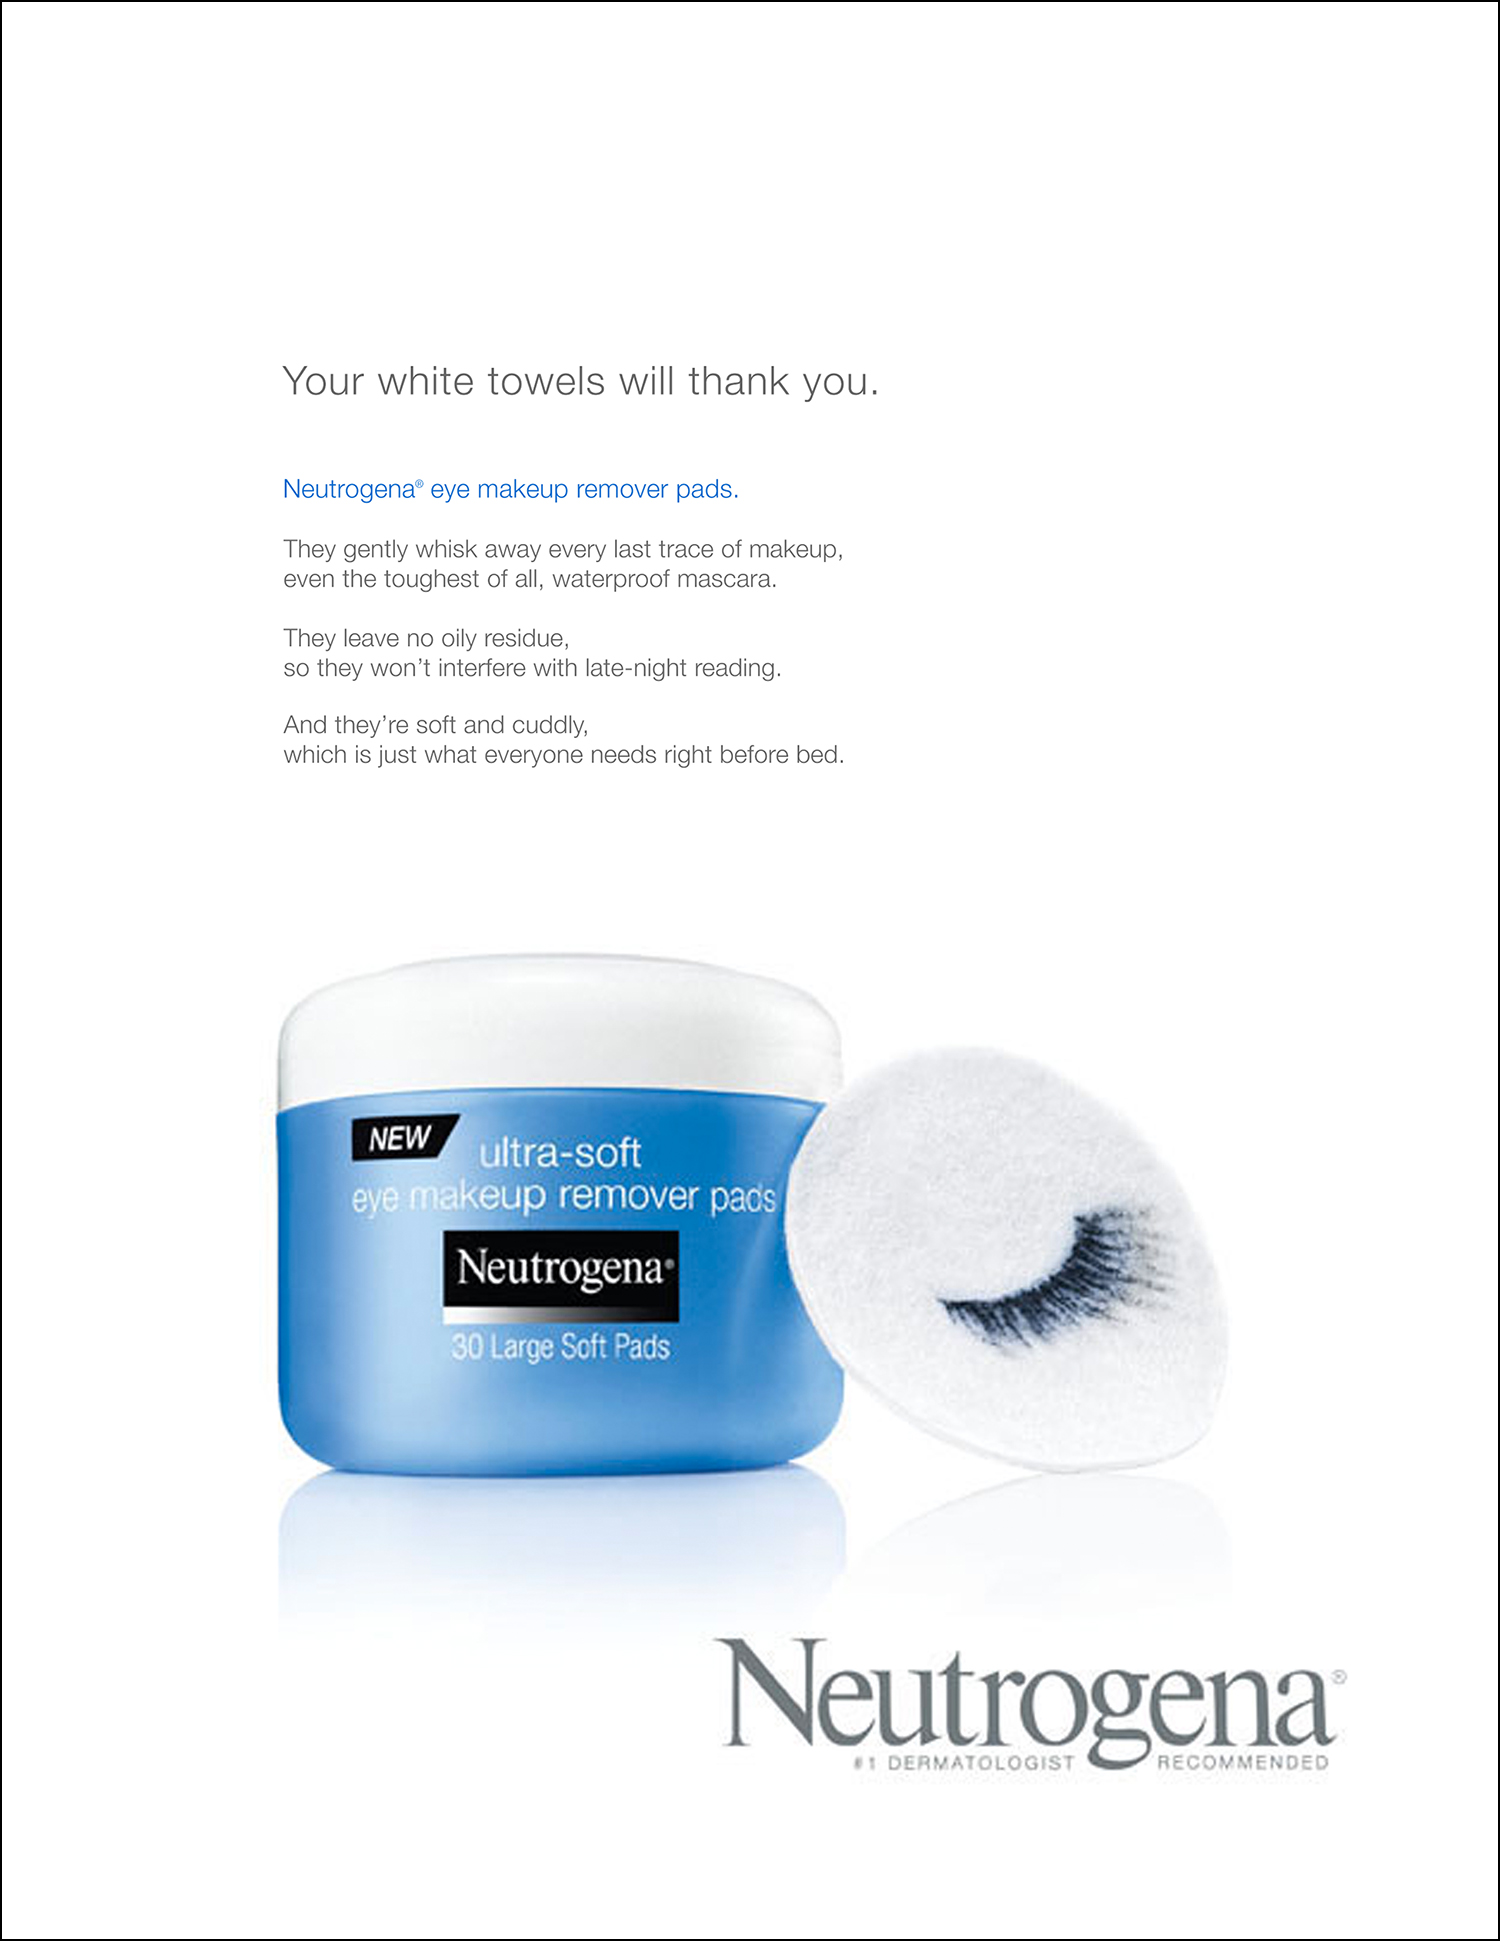 Neutrogena (Towels)